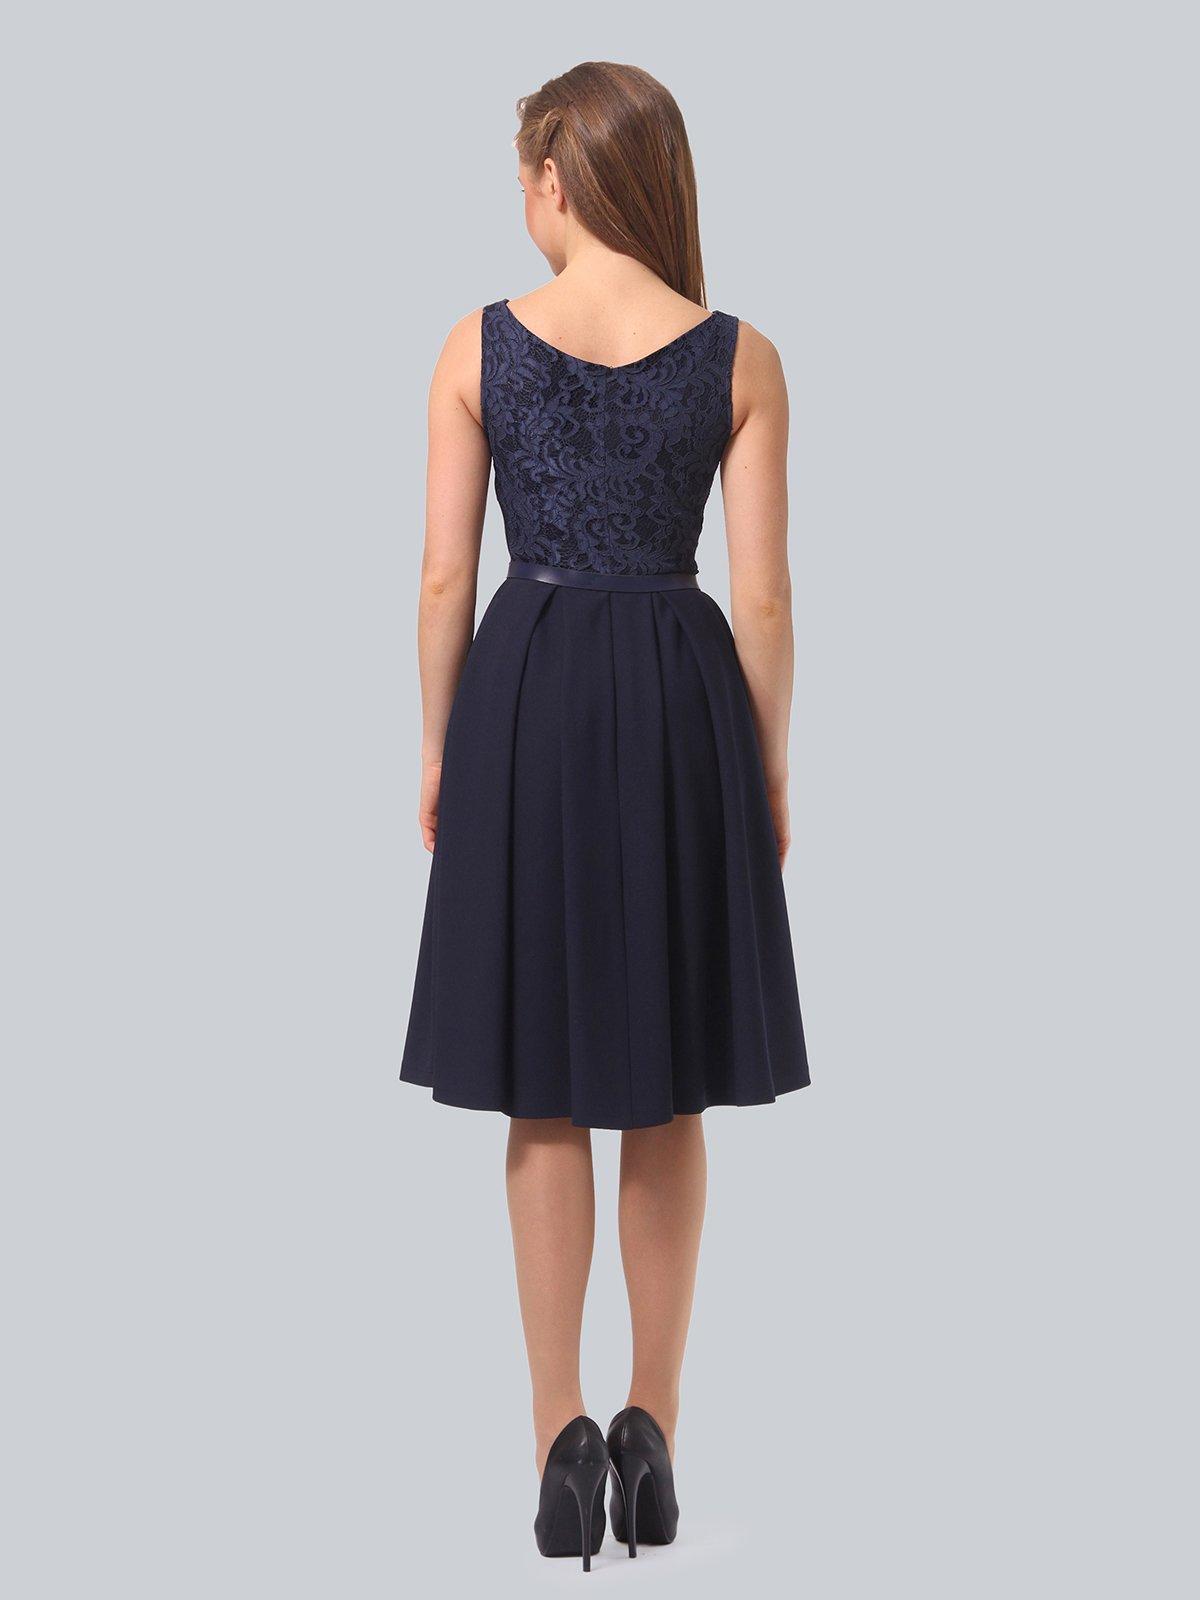 Платье темно-синее | 3863266 | фото 3